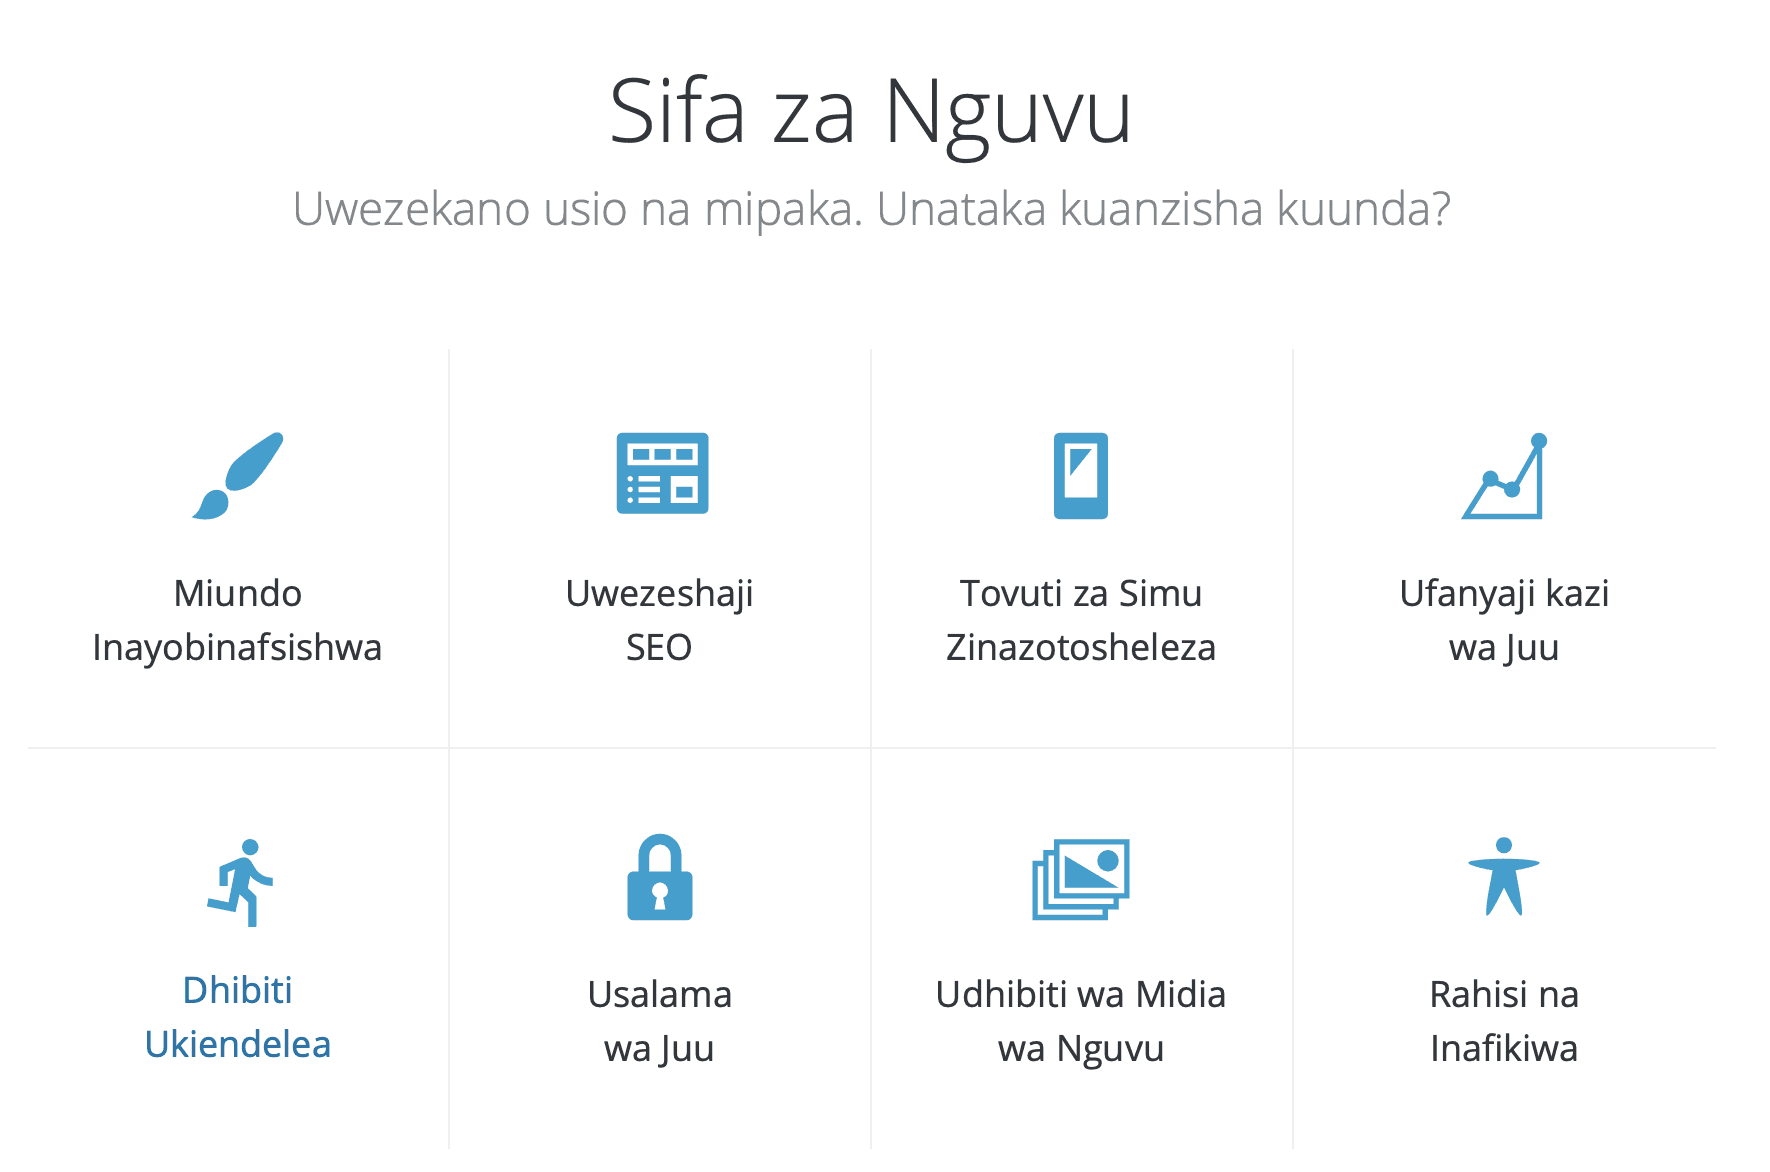 7 Months: FiFi Swahili, FiFi German, Medical Translation and WordPress in Swahili